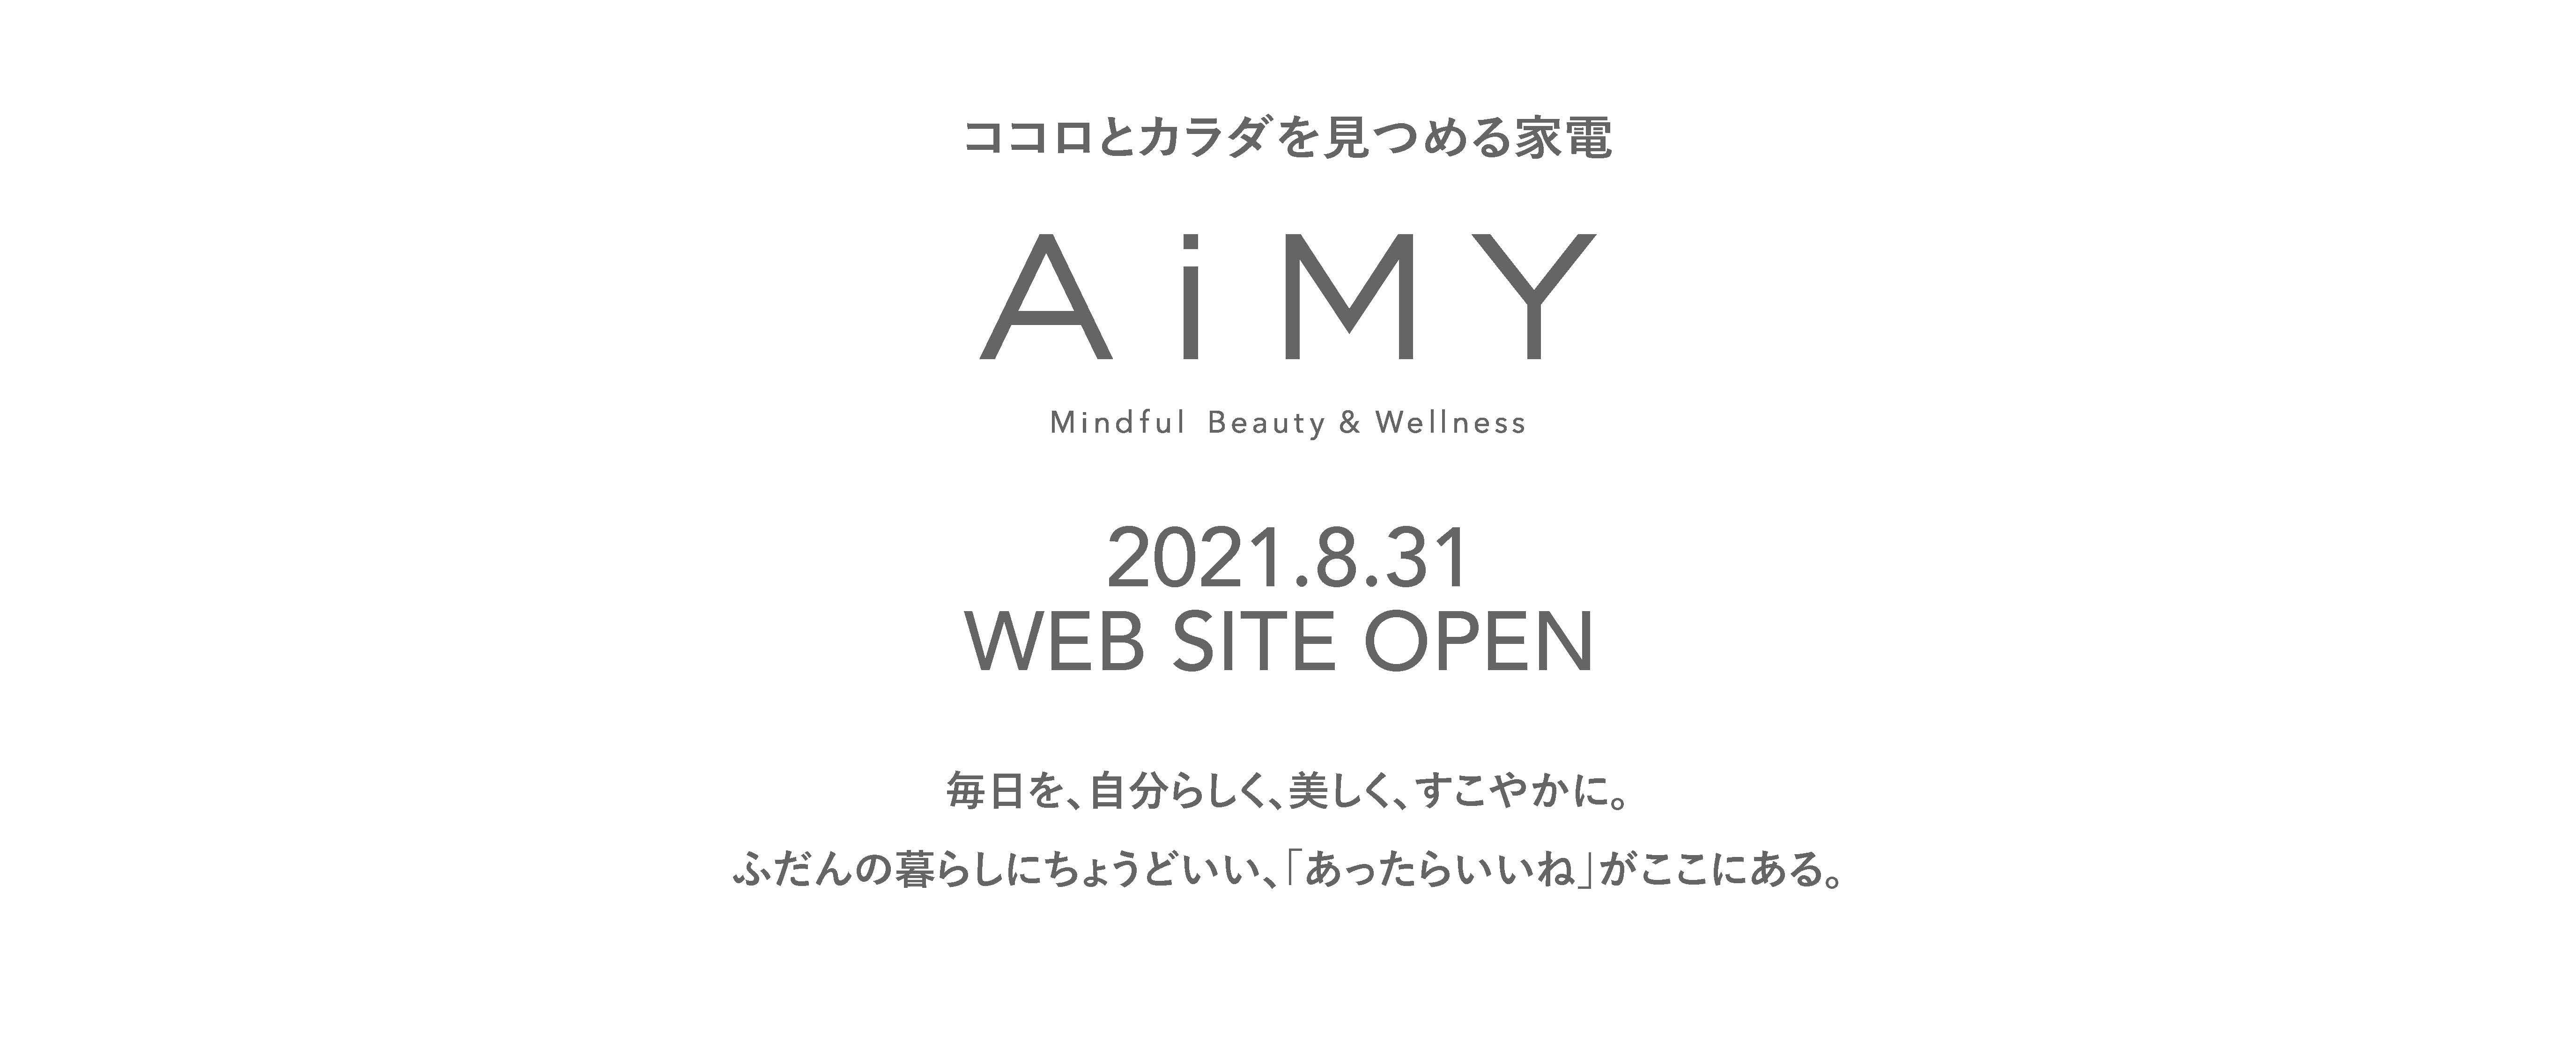 AiMY WEB SITE OPEN